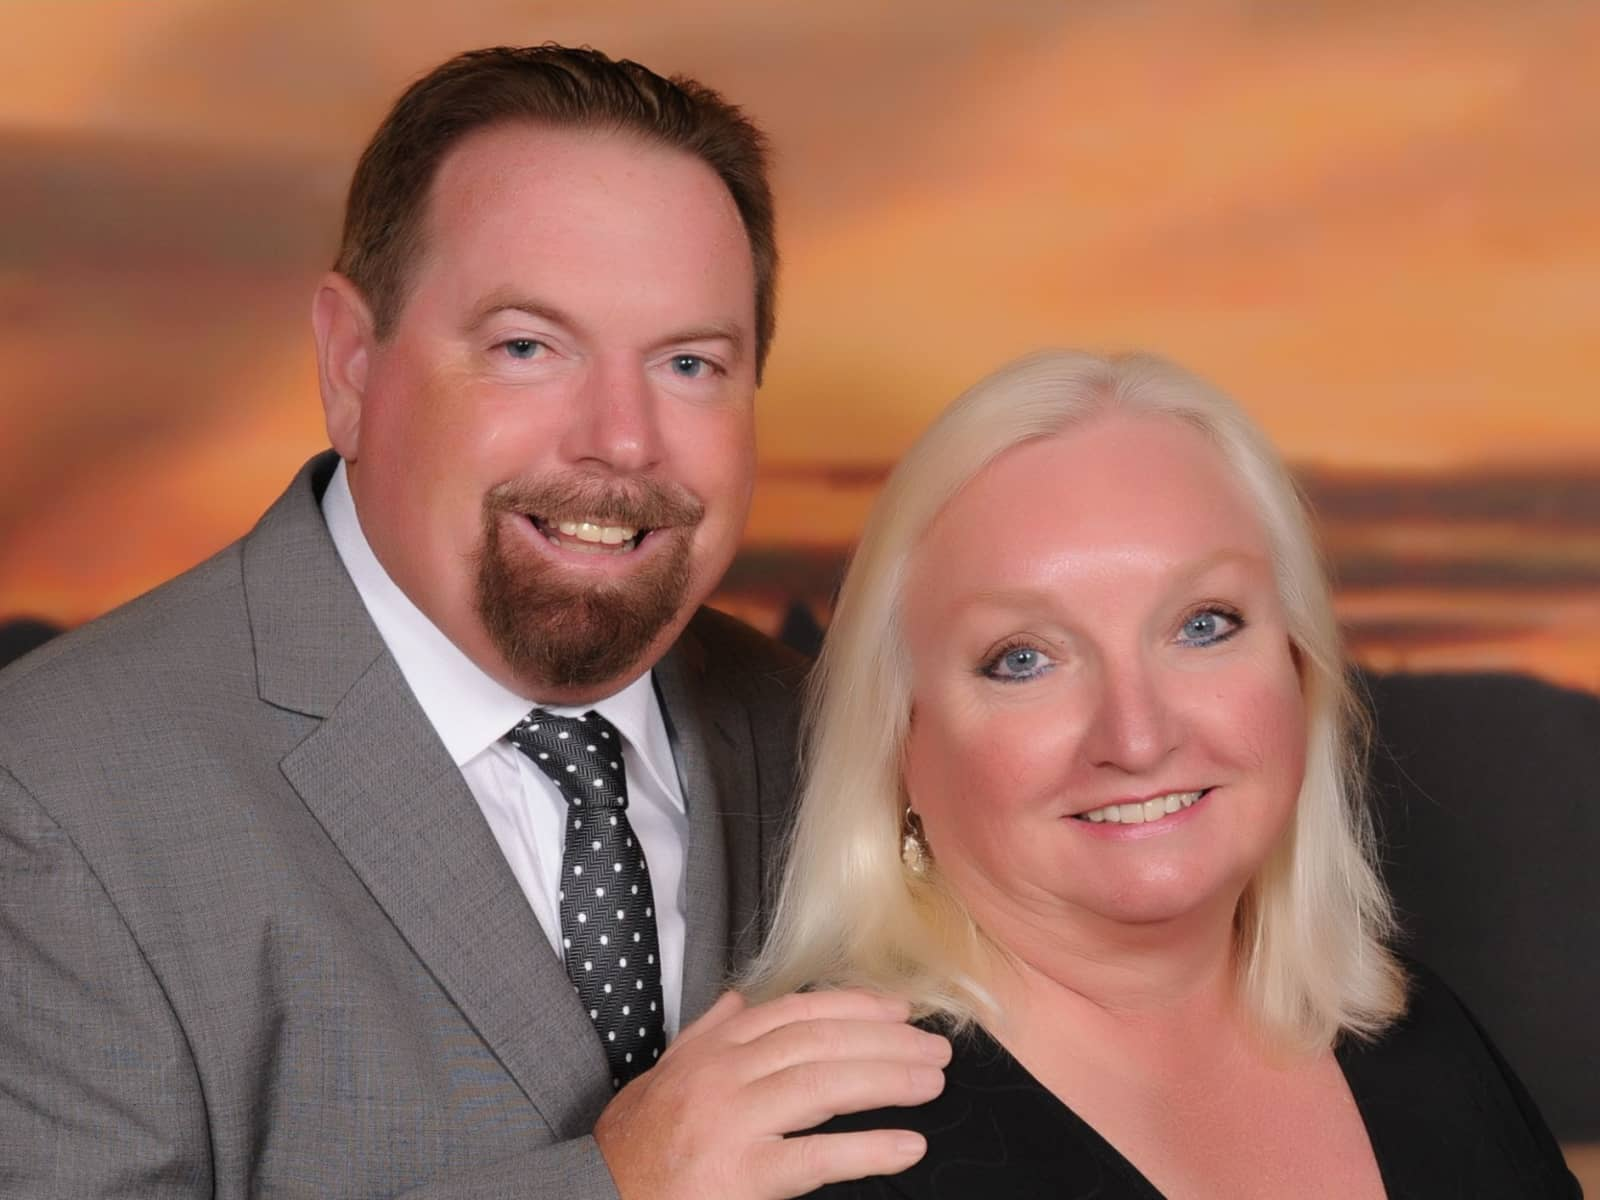 John & Angela from Sydney, New South Wales, Australia